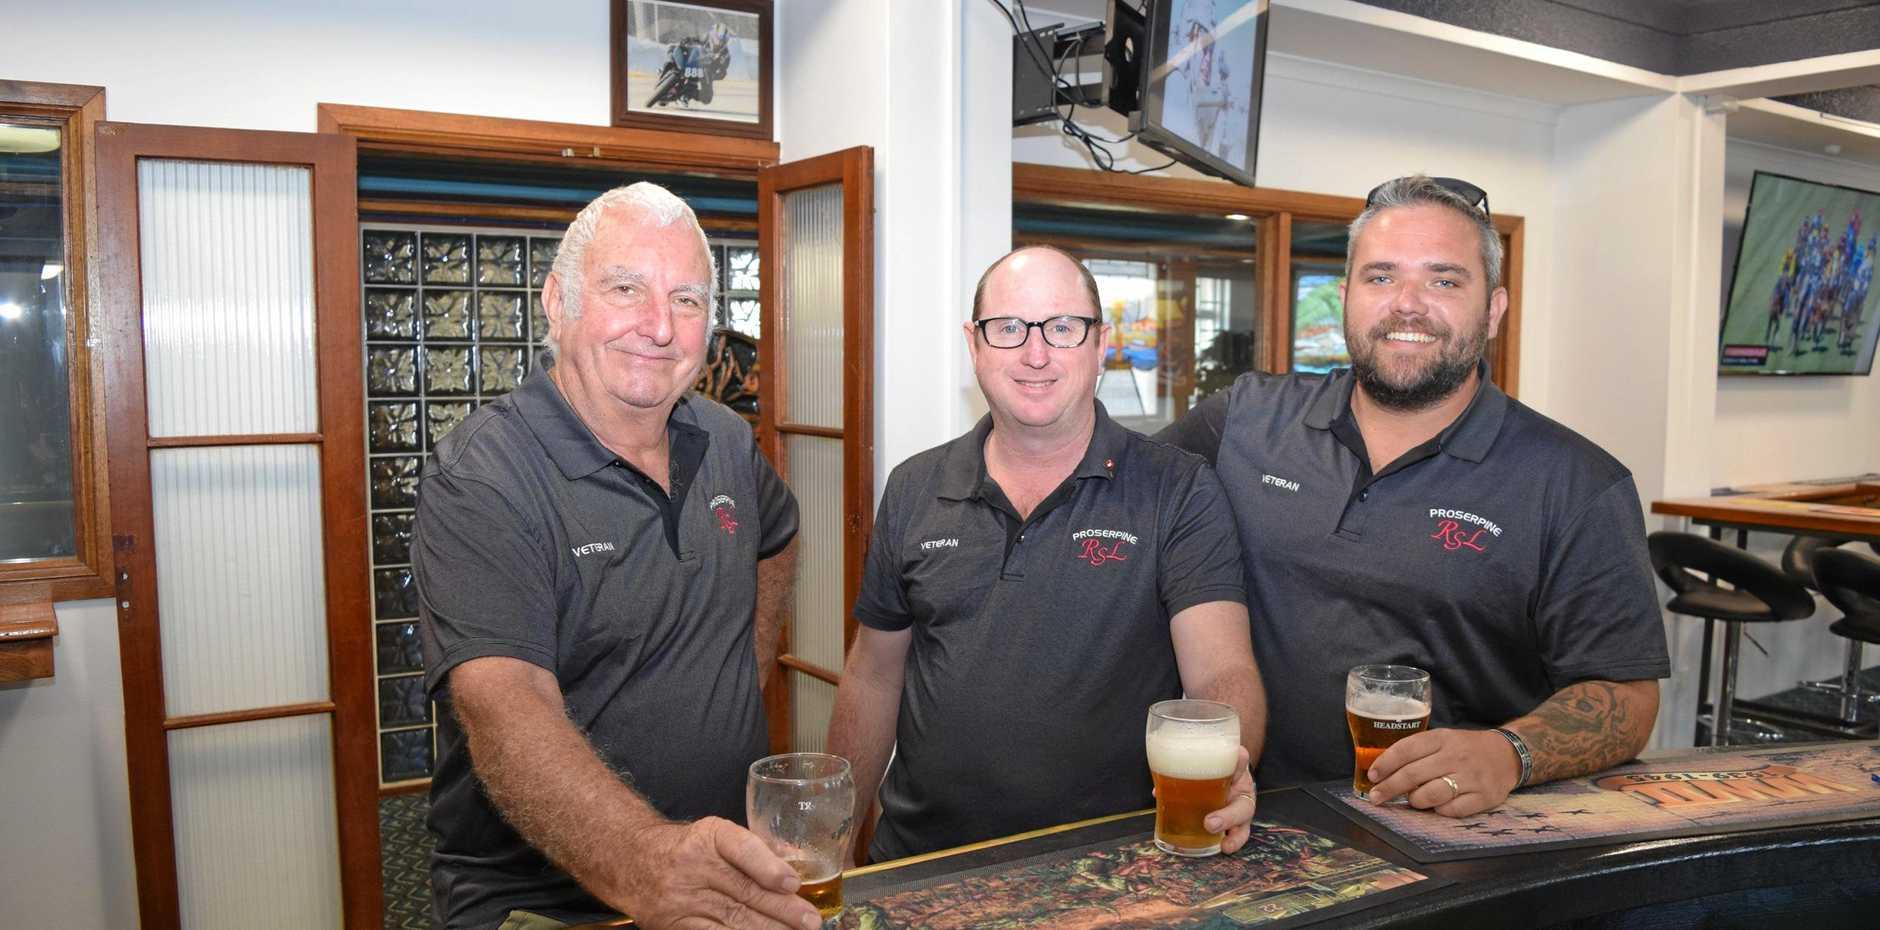 Brian Dunlop, John Hammond and Daniel Hatton at the newly refurbished Proserpine RSL Club.